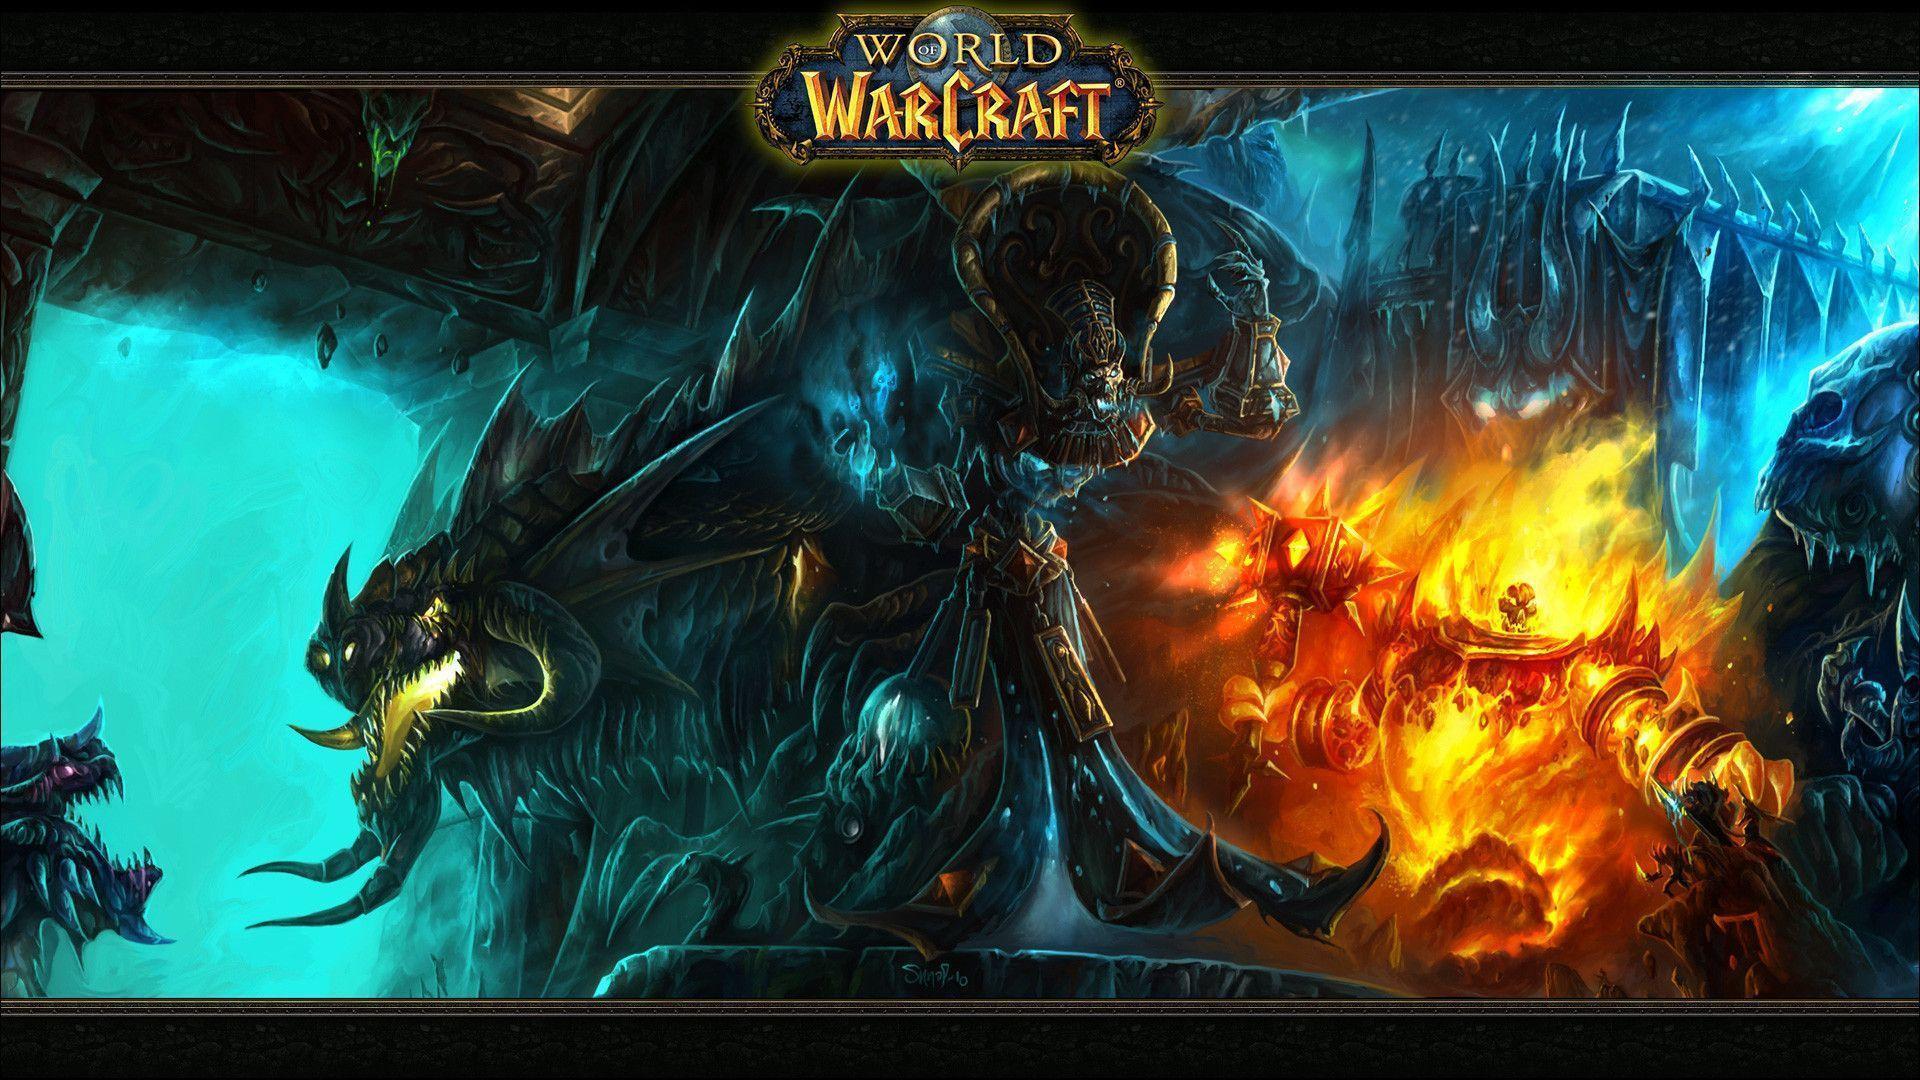 world of warcraft wallpaper 4k 1920x1080